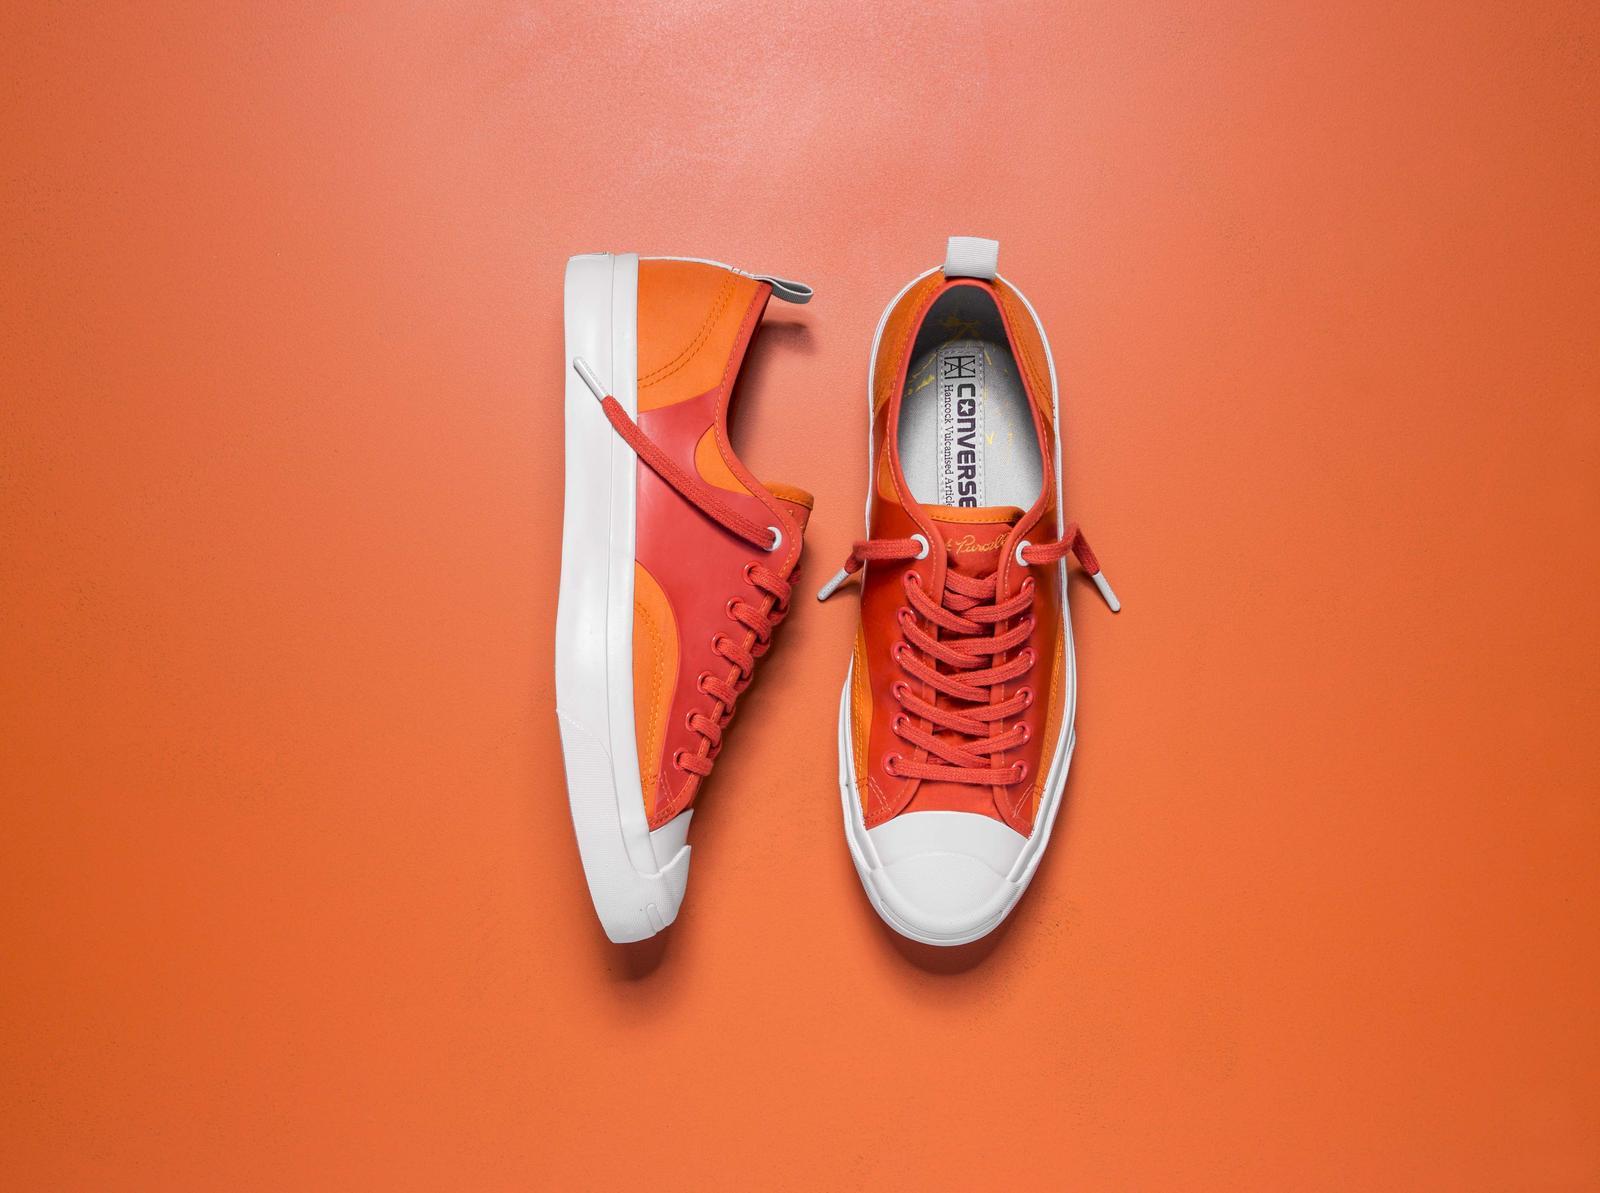 Hancock Nike Shoes